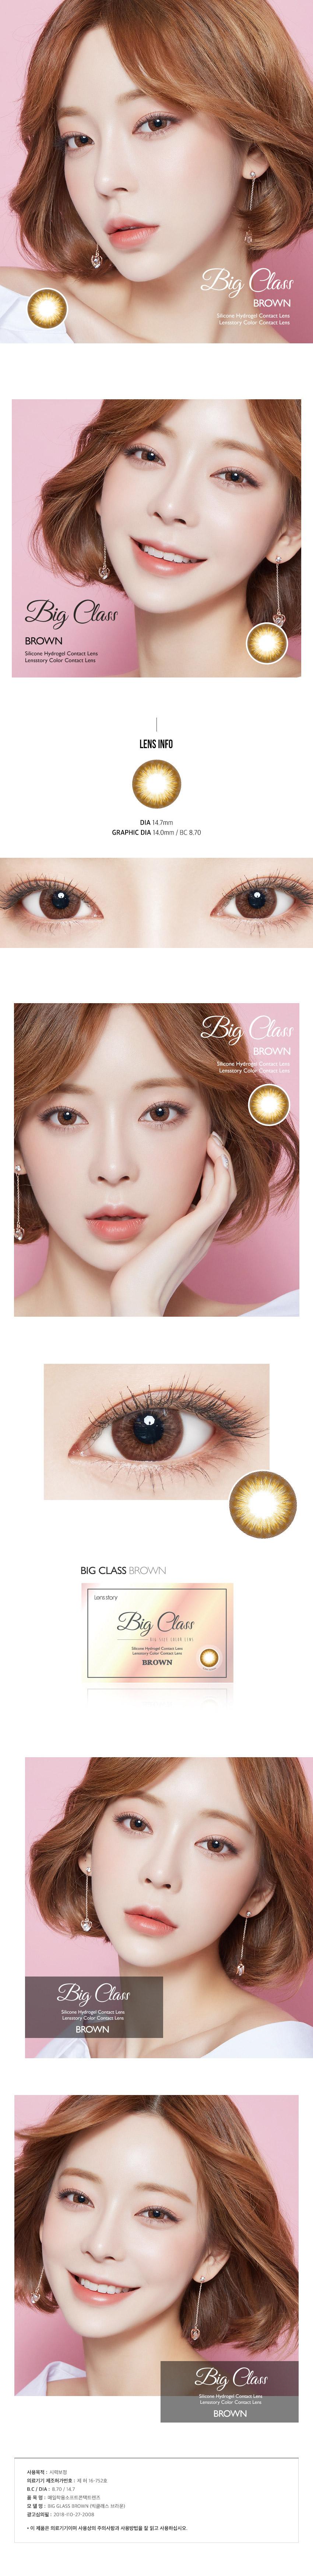 big-class-brown-circle-lenses.jpg